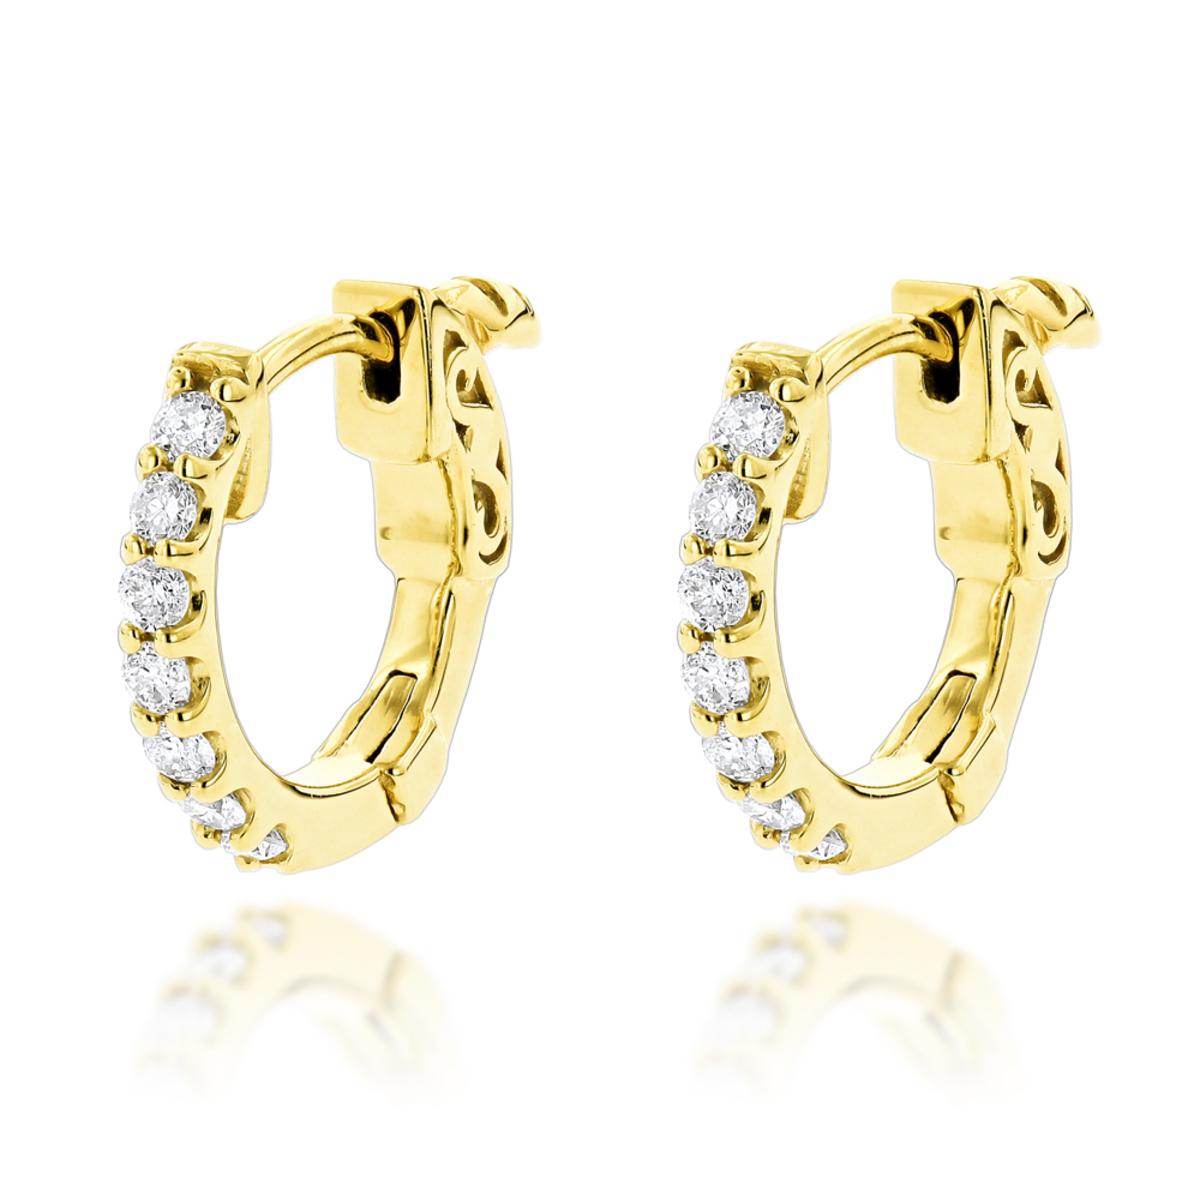 14K Gold Diamond Huggie Earrings 0.21ct